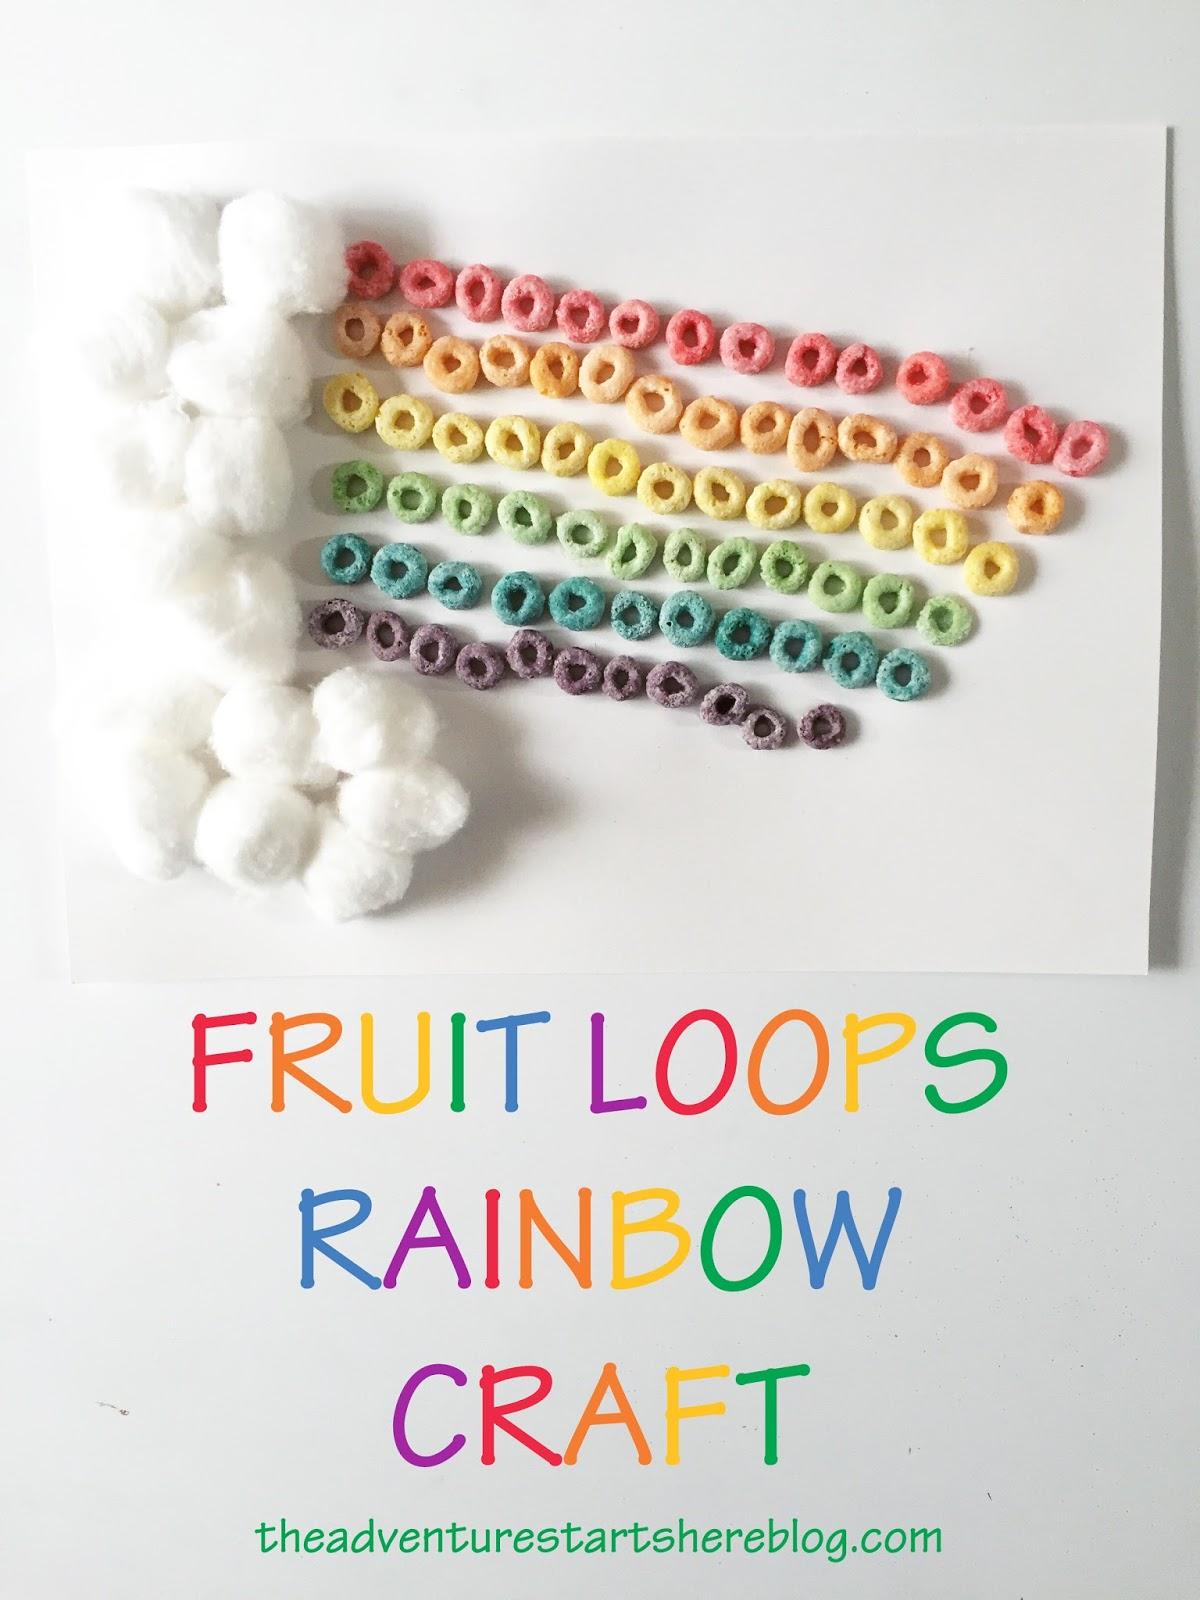 The Adventure Starts Here Fruit Loops Rainbow